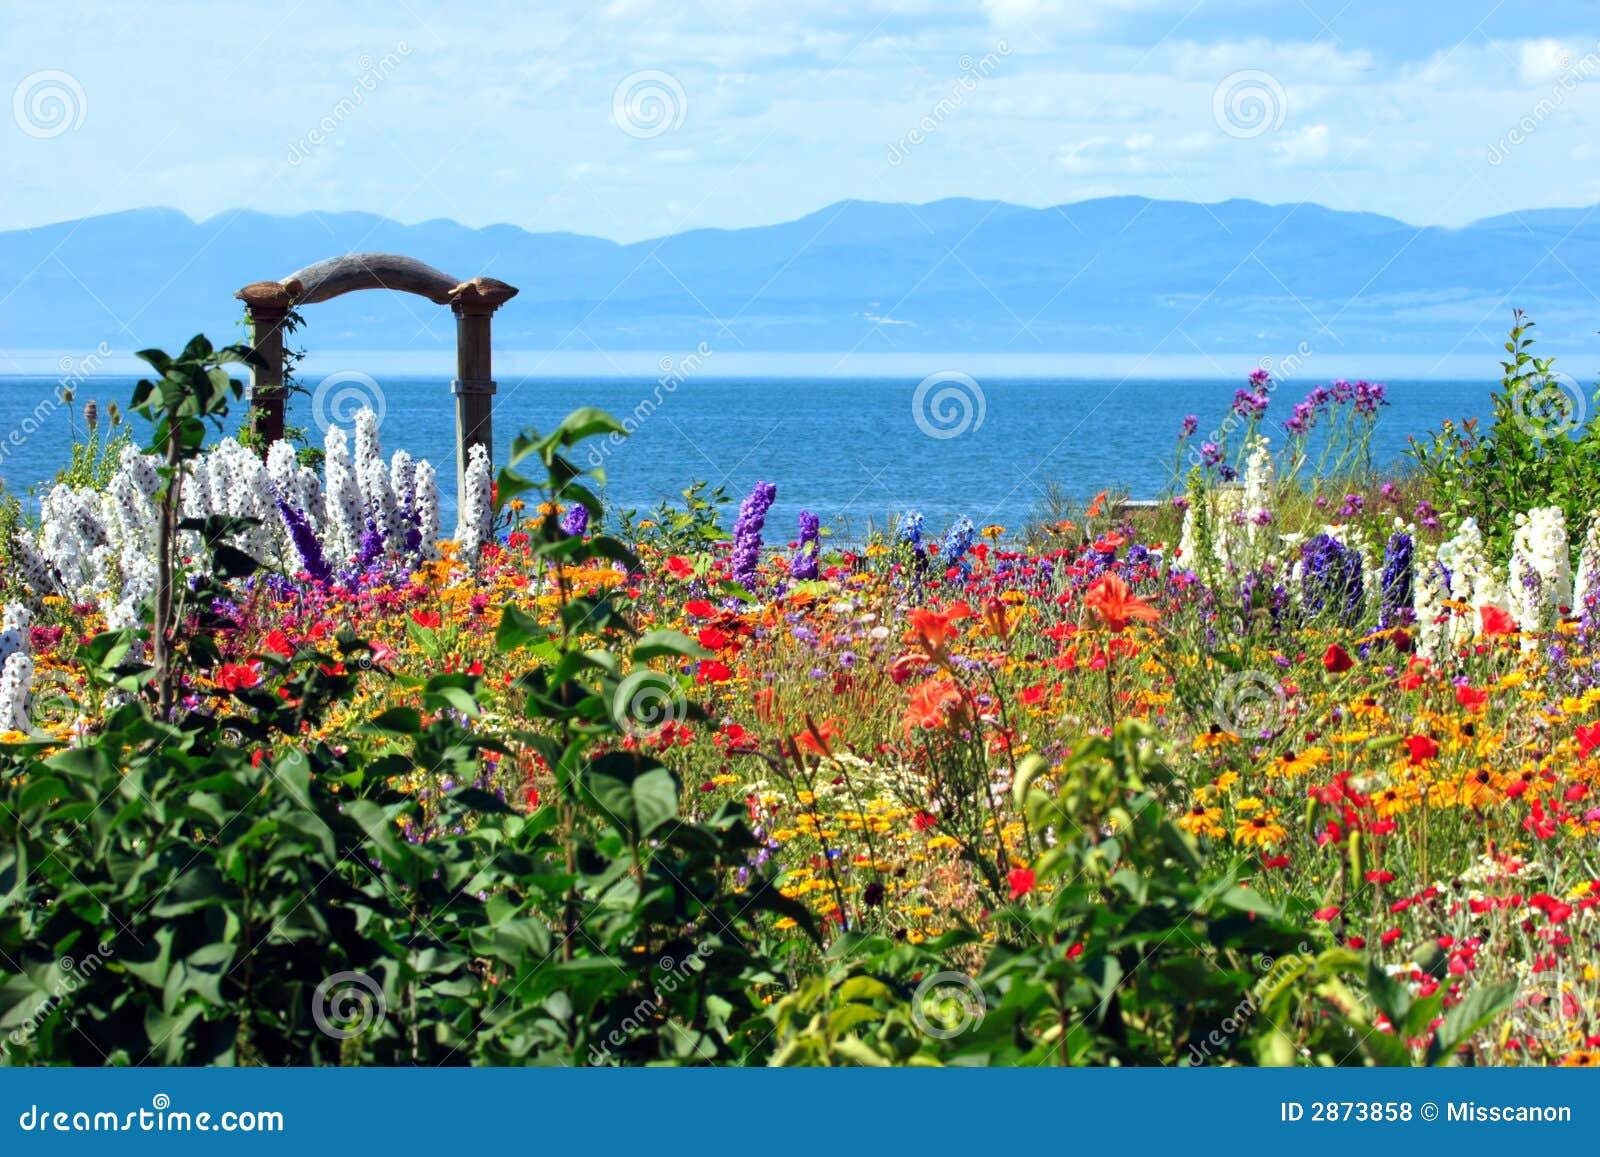 Amazing Flower Garden Royalty Free Stock Photos